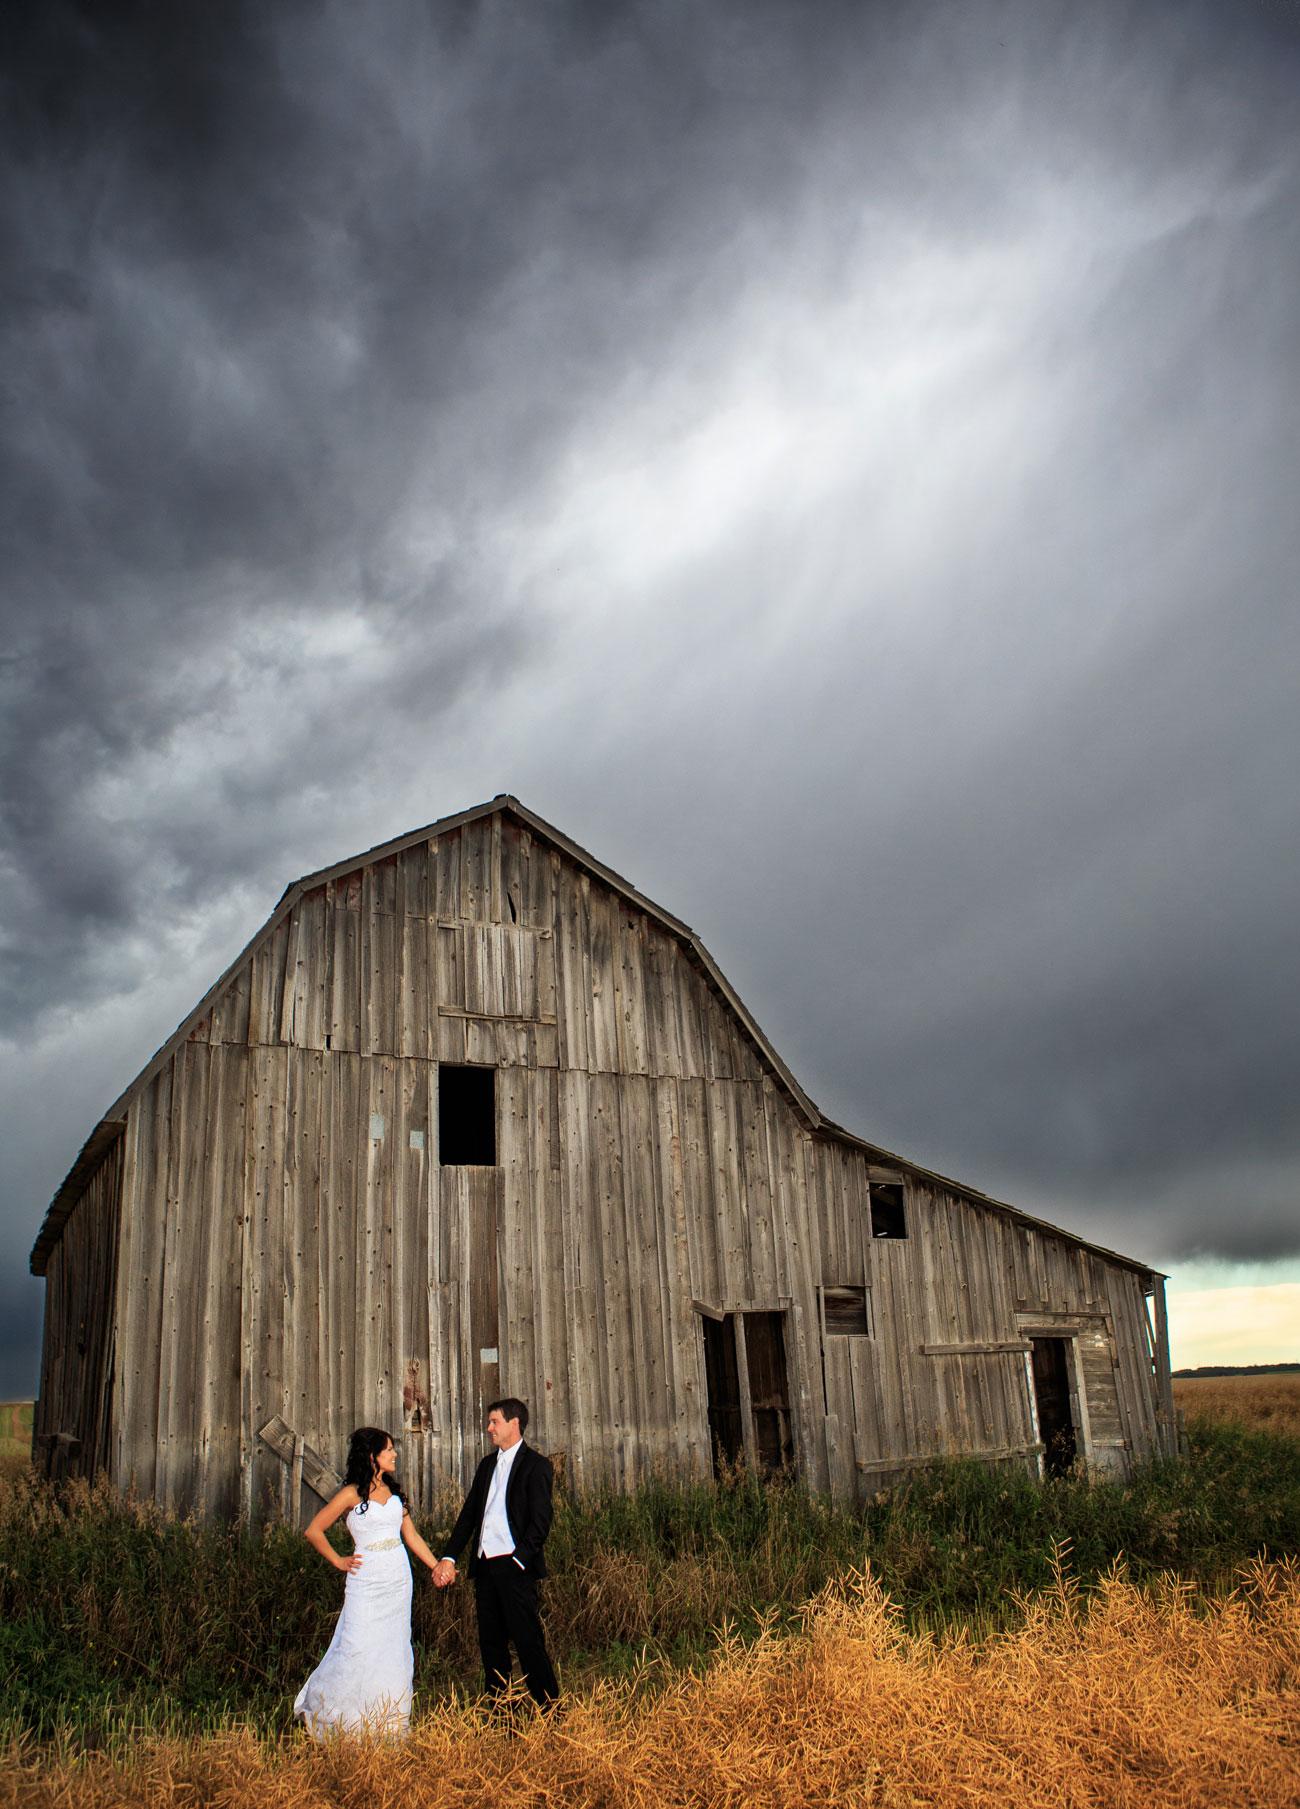 Myranda & Cole - Three Hills, Alberta - Wedding Photography (26)